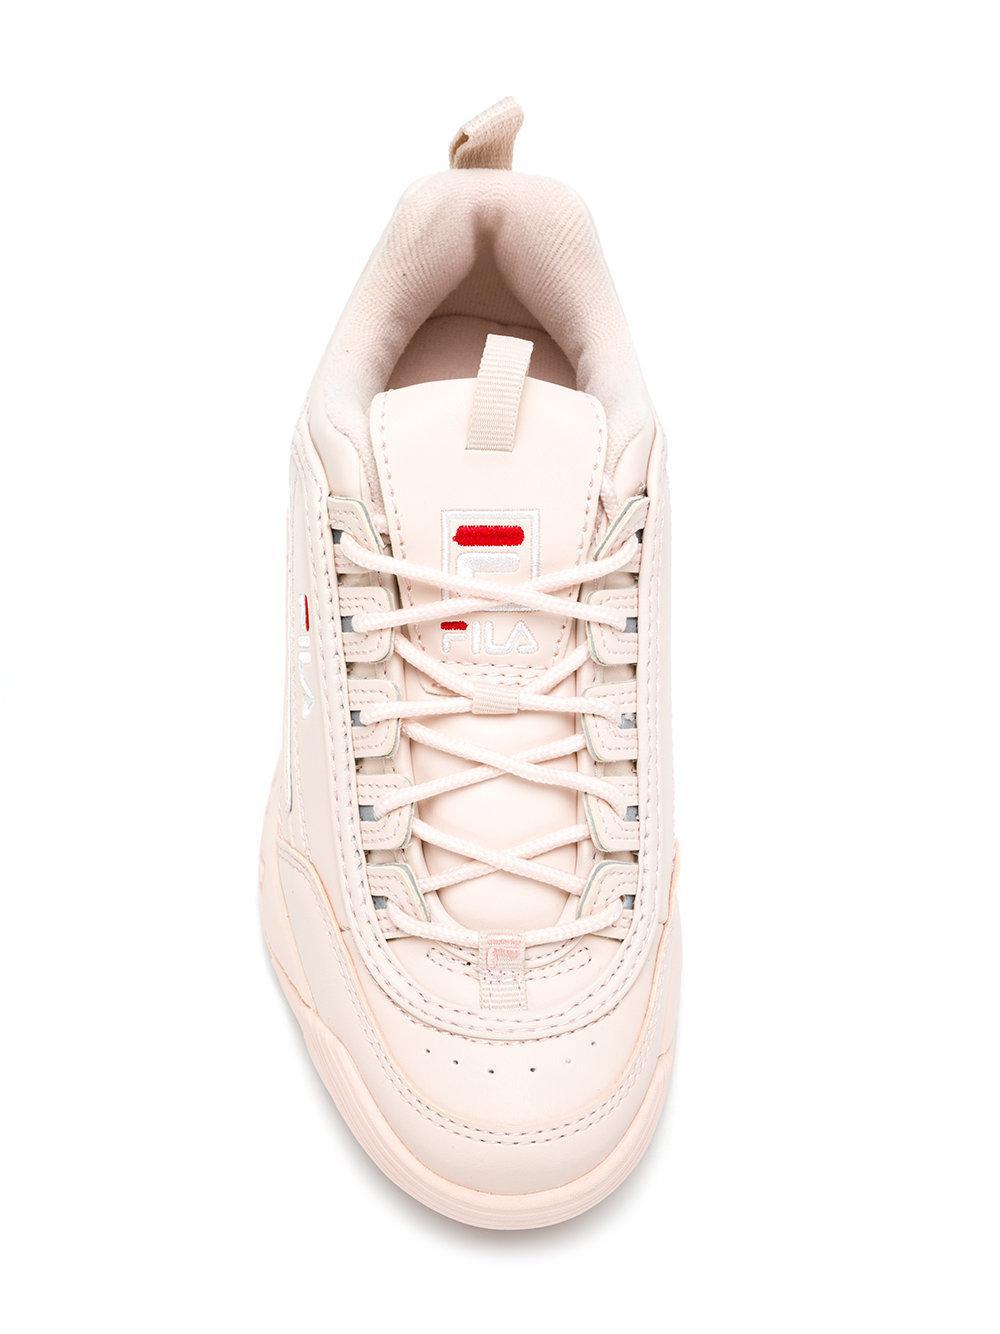 Fila Leather Disruptor Sneakers in Pink & Purple (Pink)